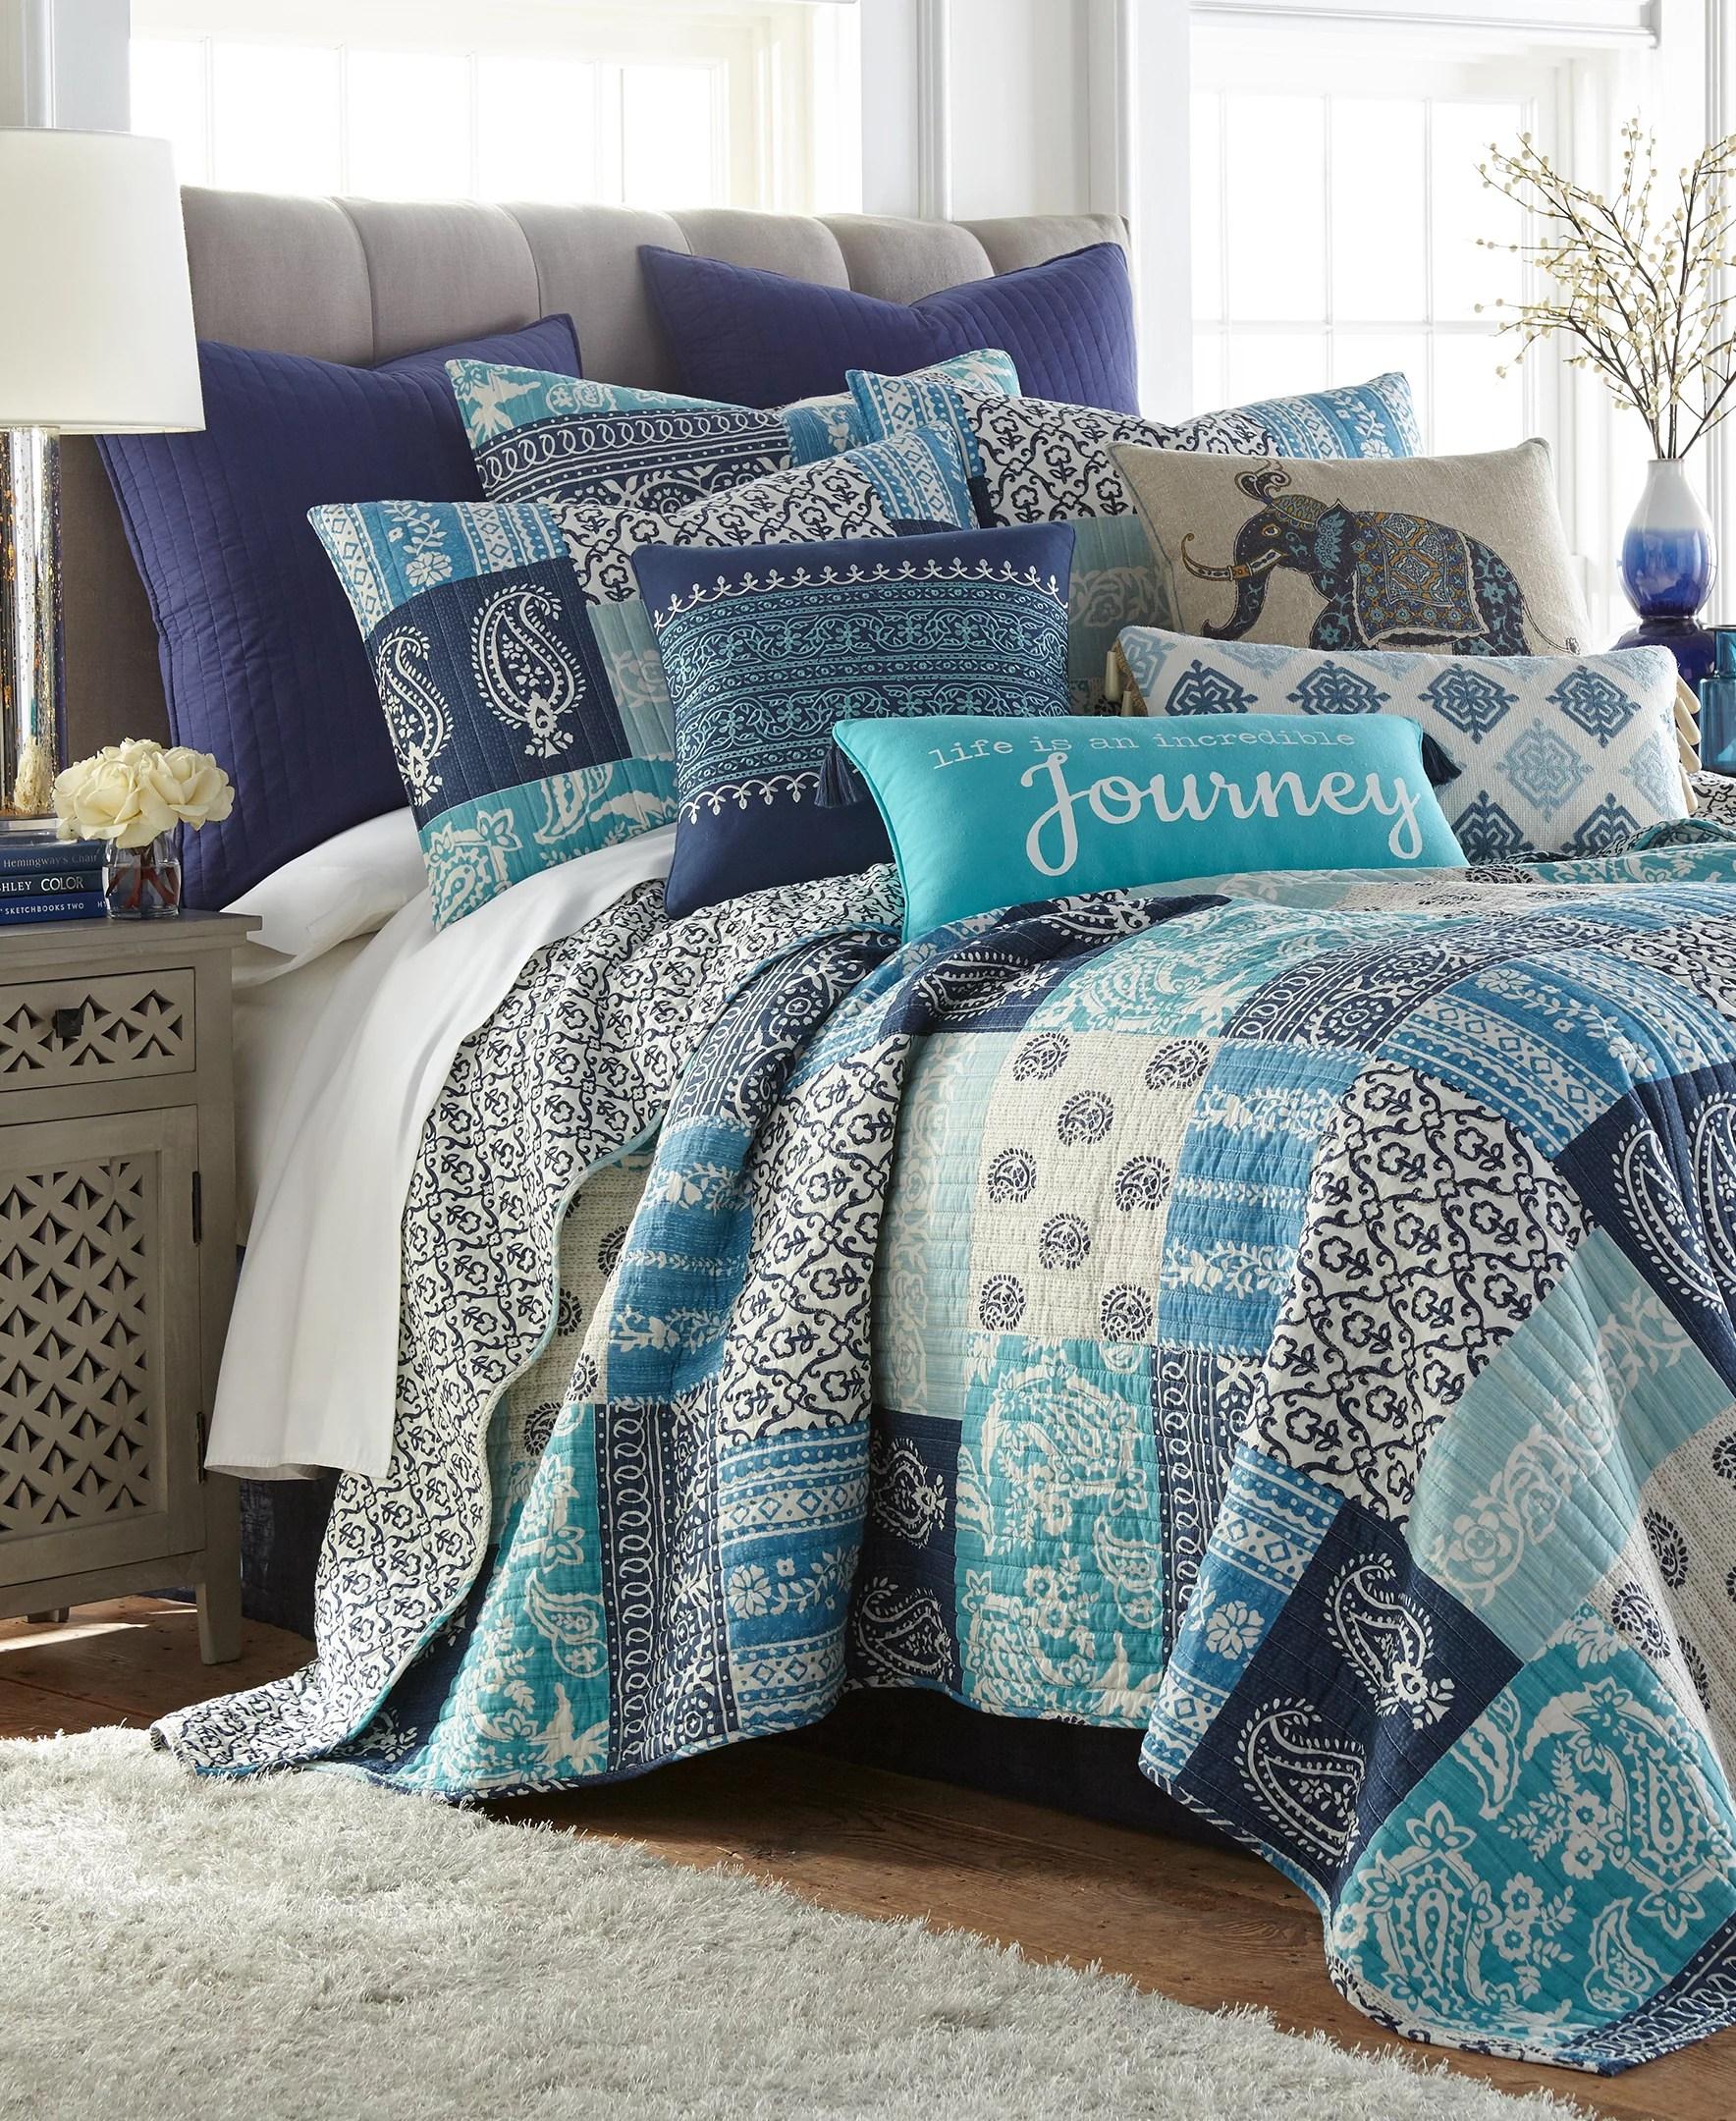 levtex home chandra quilt set queen quilt two standard pillow shams navy blue teal cream quilt 88x92in and pillow shams 26x20in